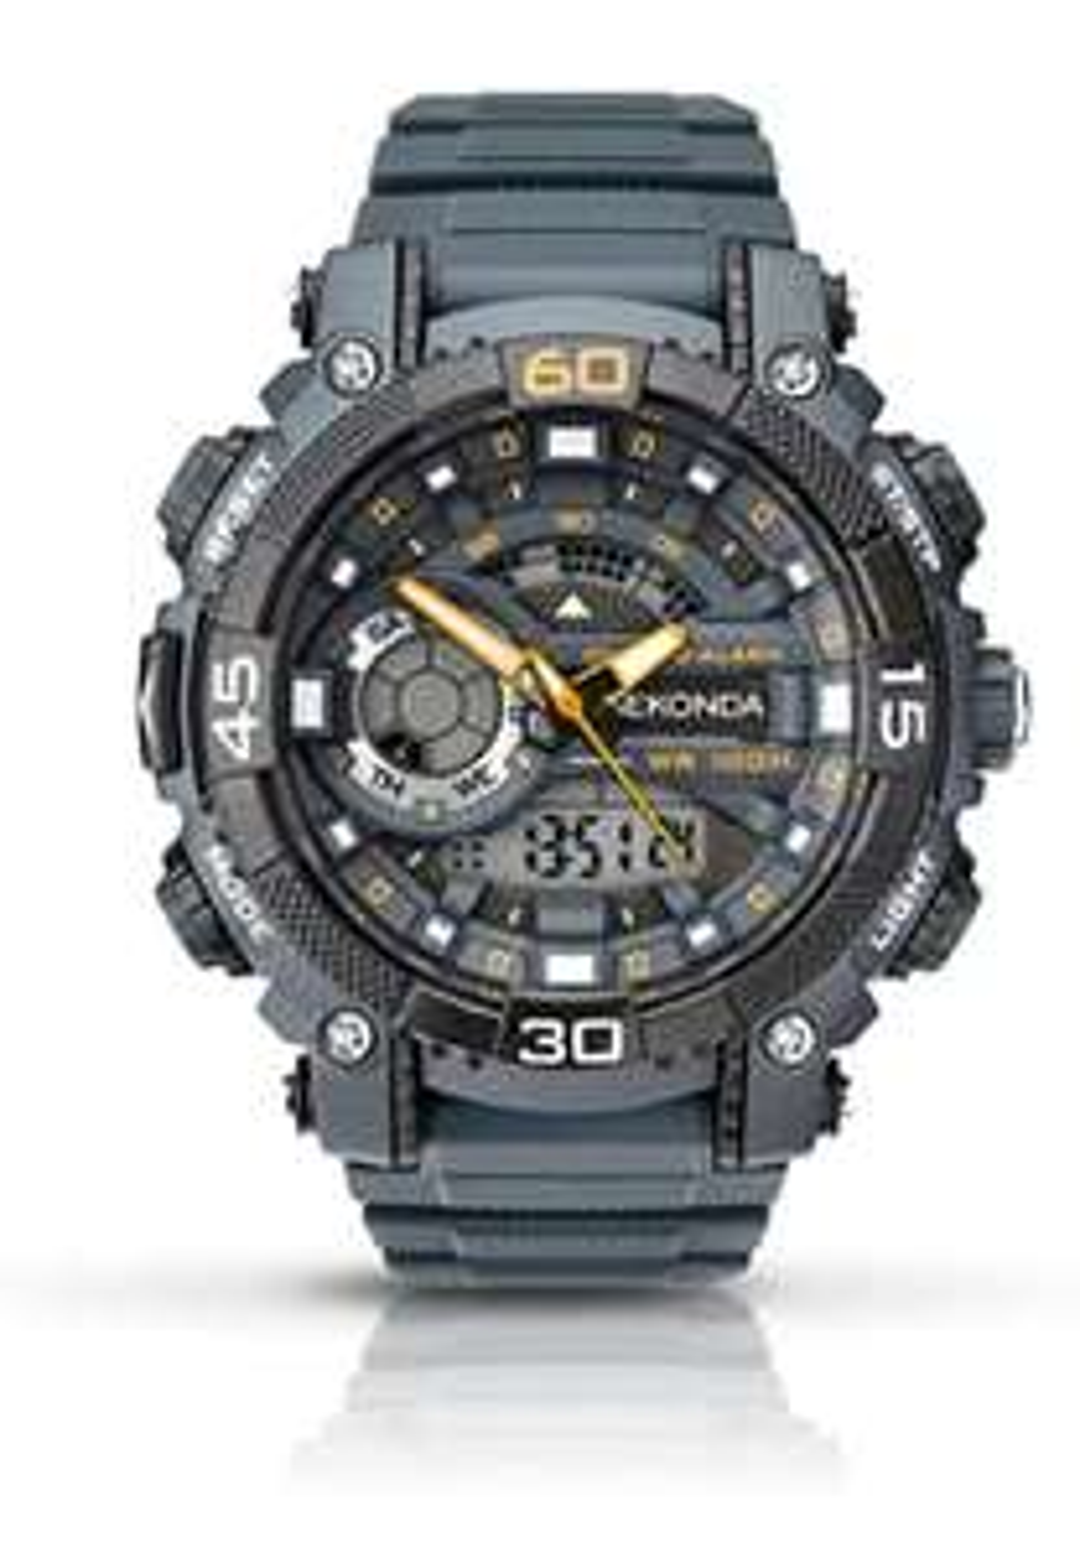 SEKONDA Mens Digital Quartz Watch - £42.19 @ Amazon